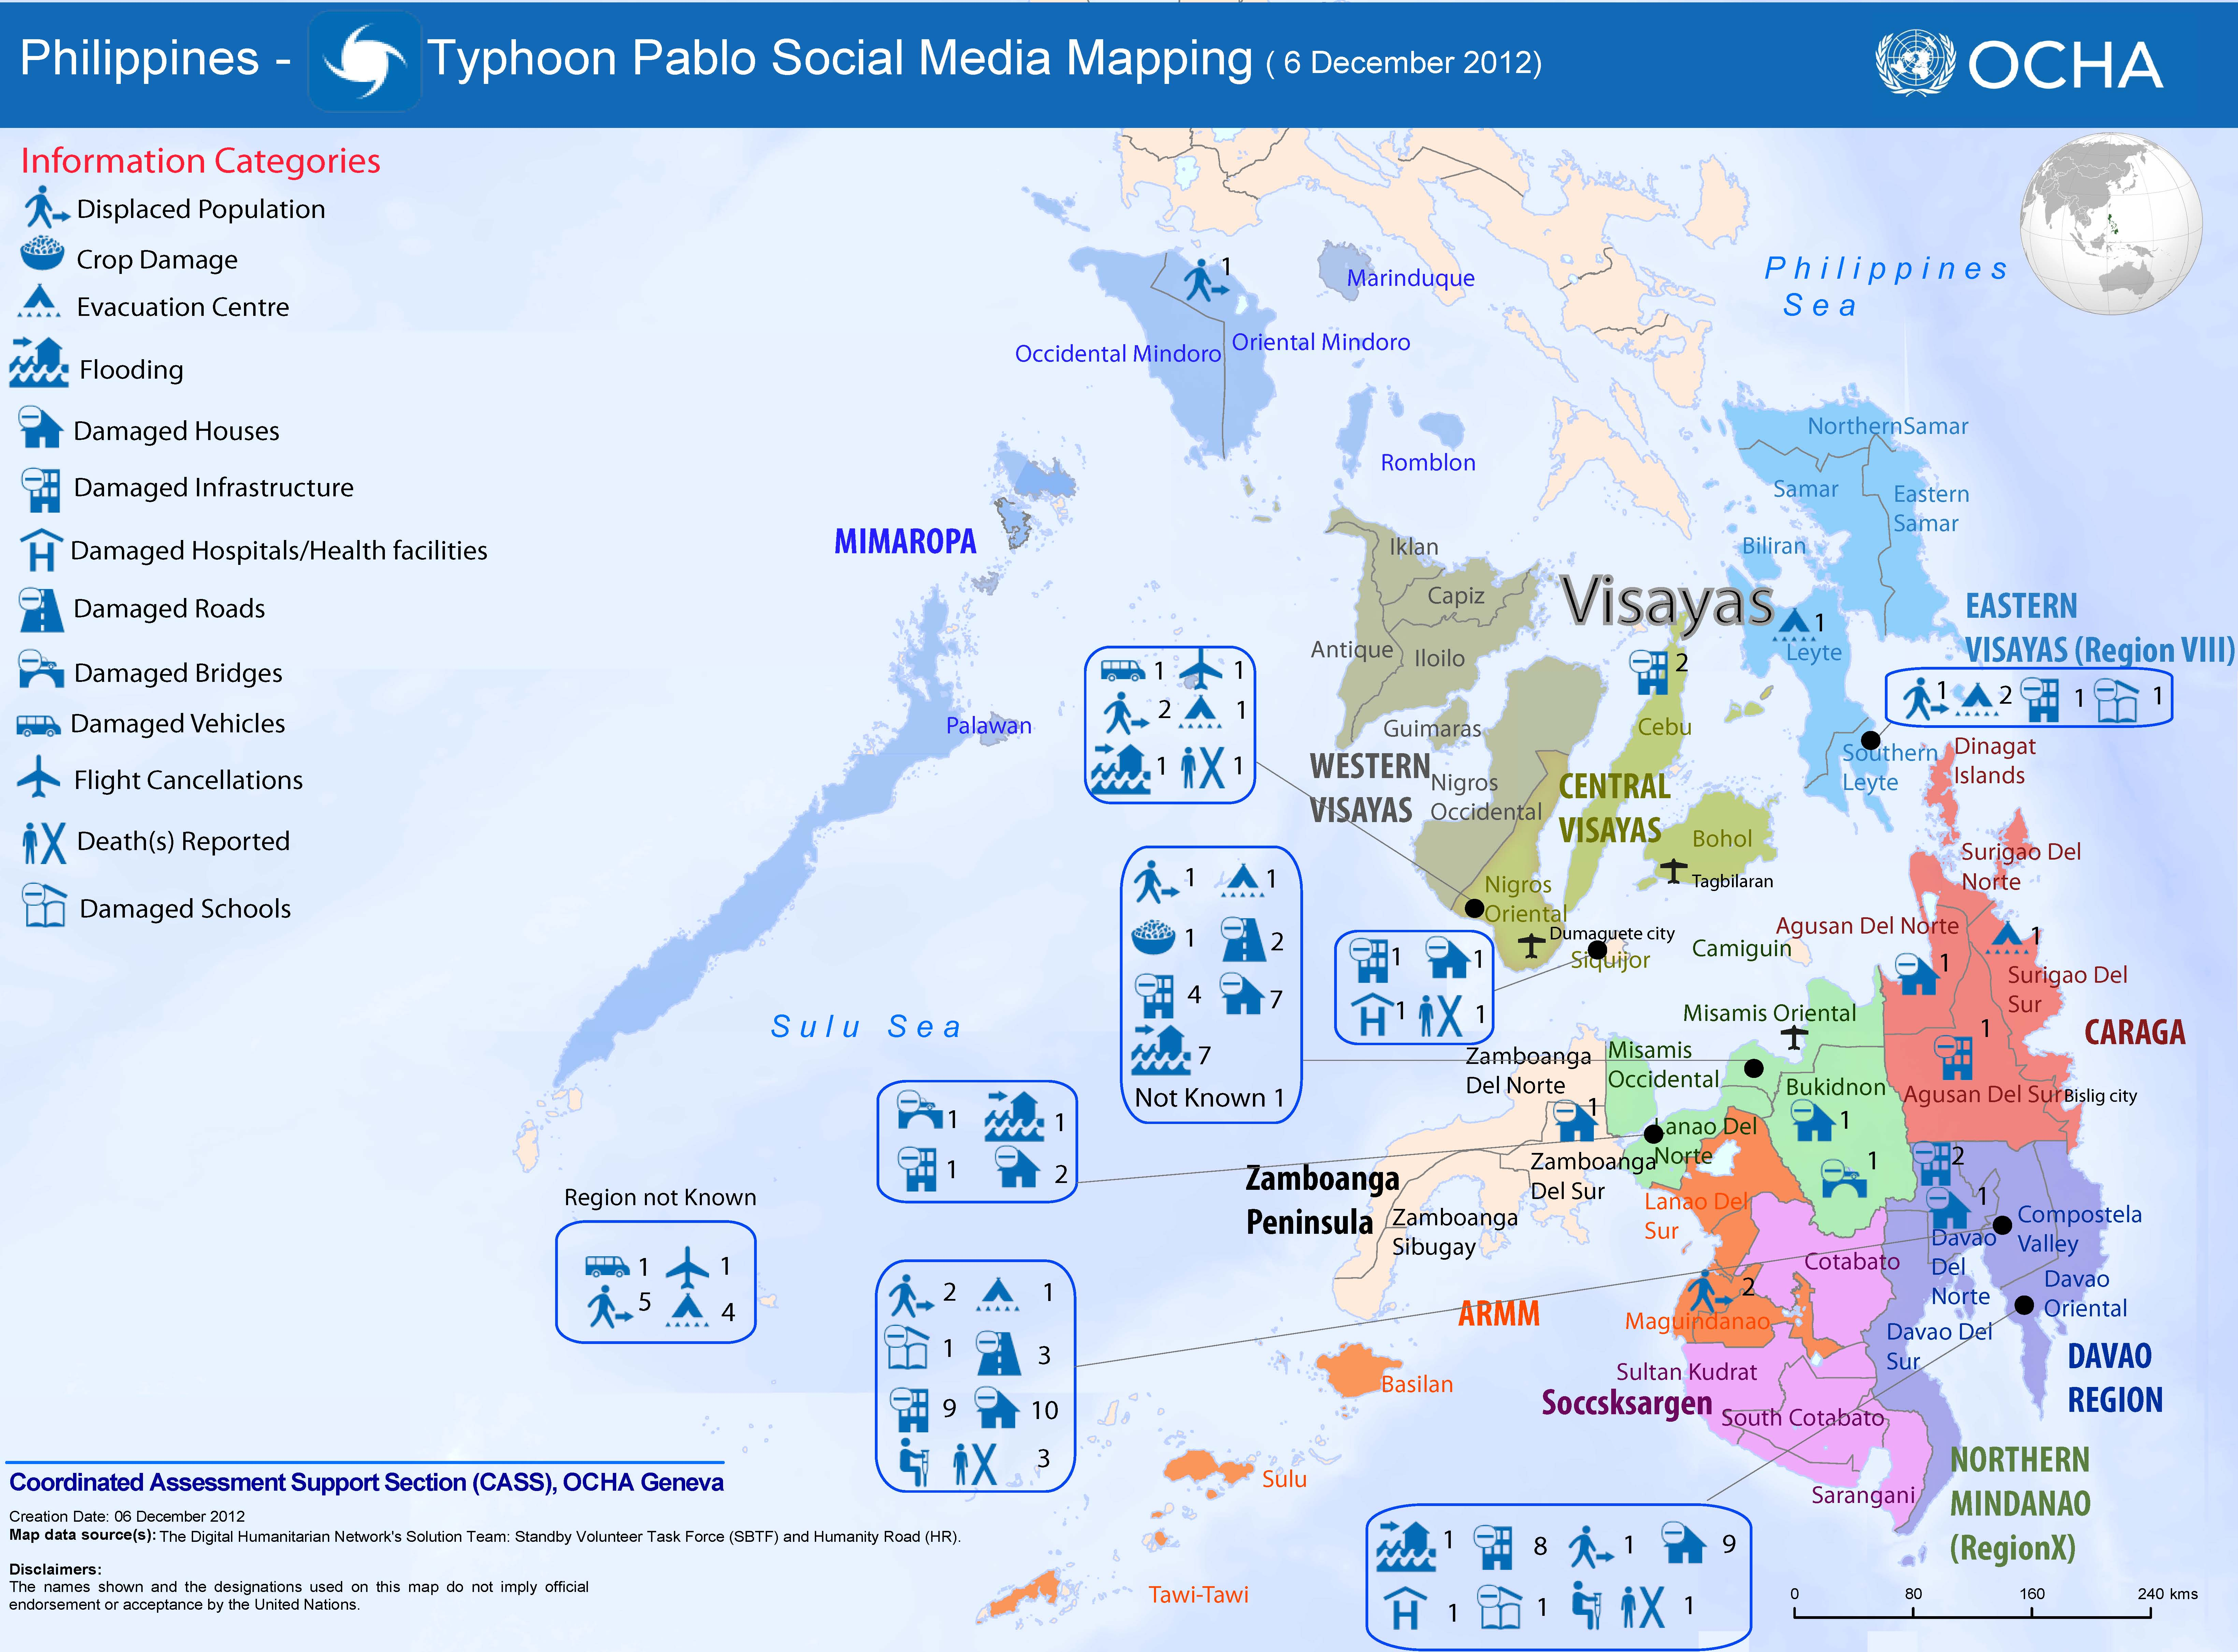 typhon-pablo_social_media_mapping-ocha_a4_portrait_6dec2012